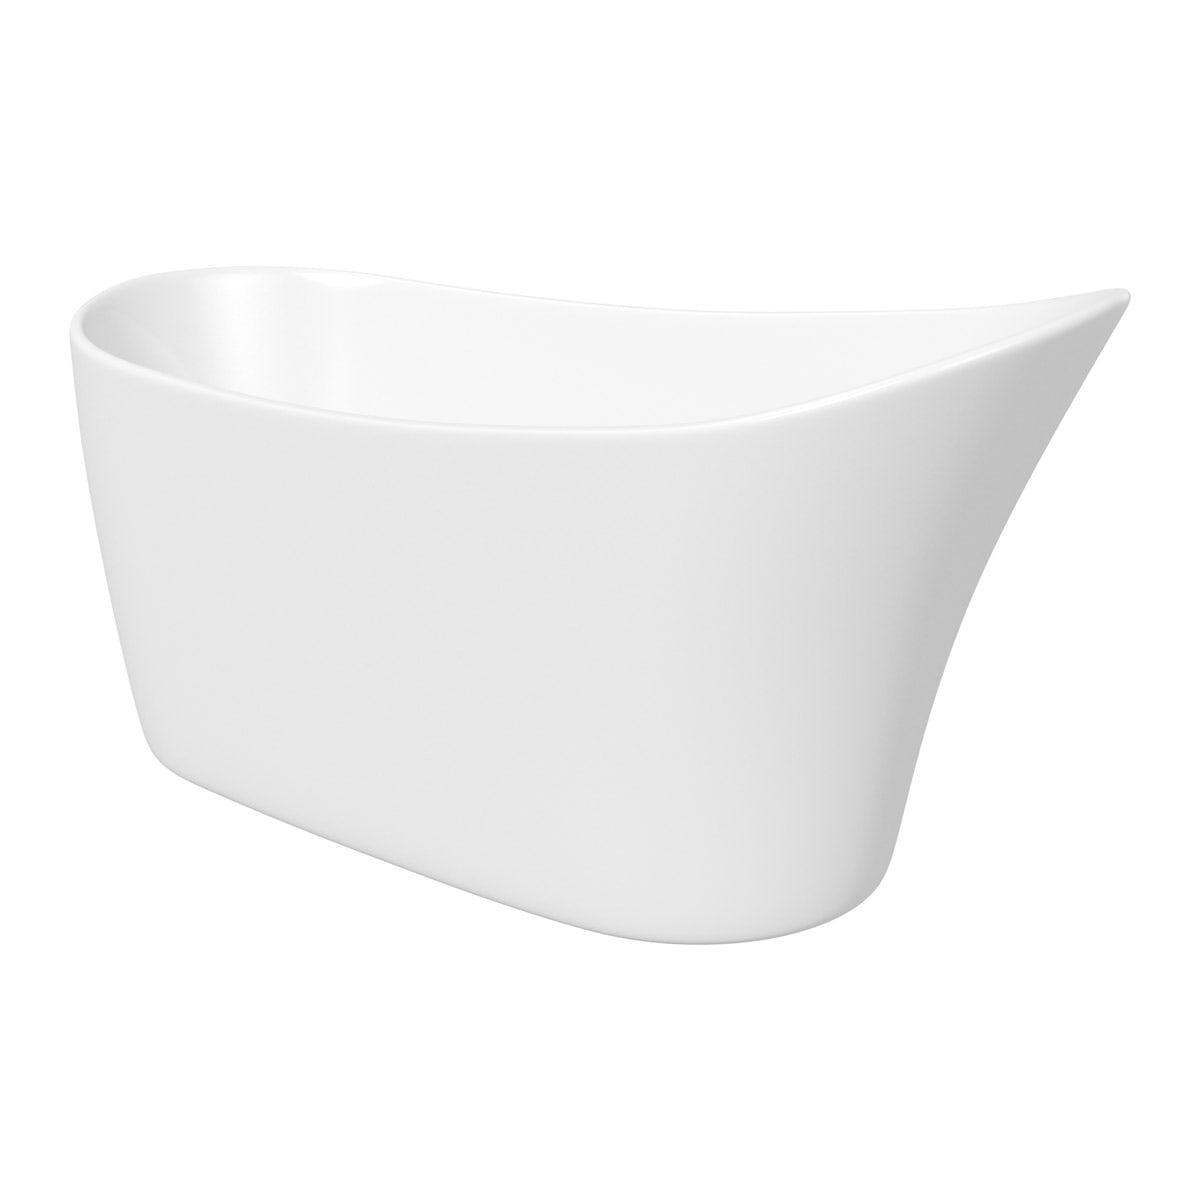 Hardy freestanding bath 1600 x 750